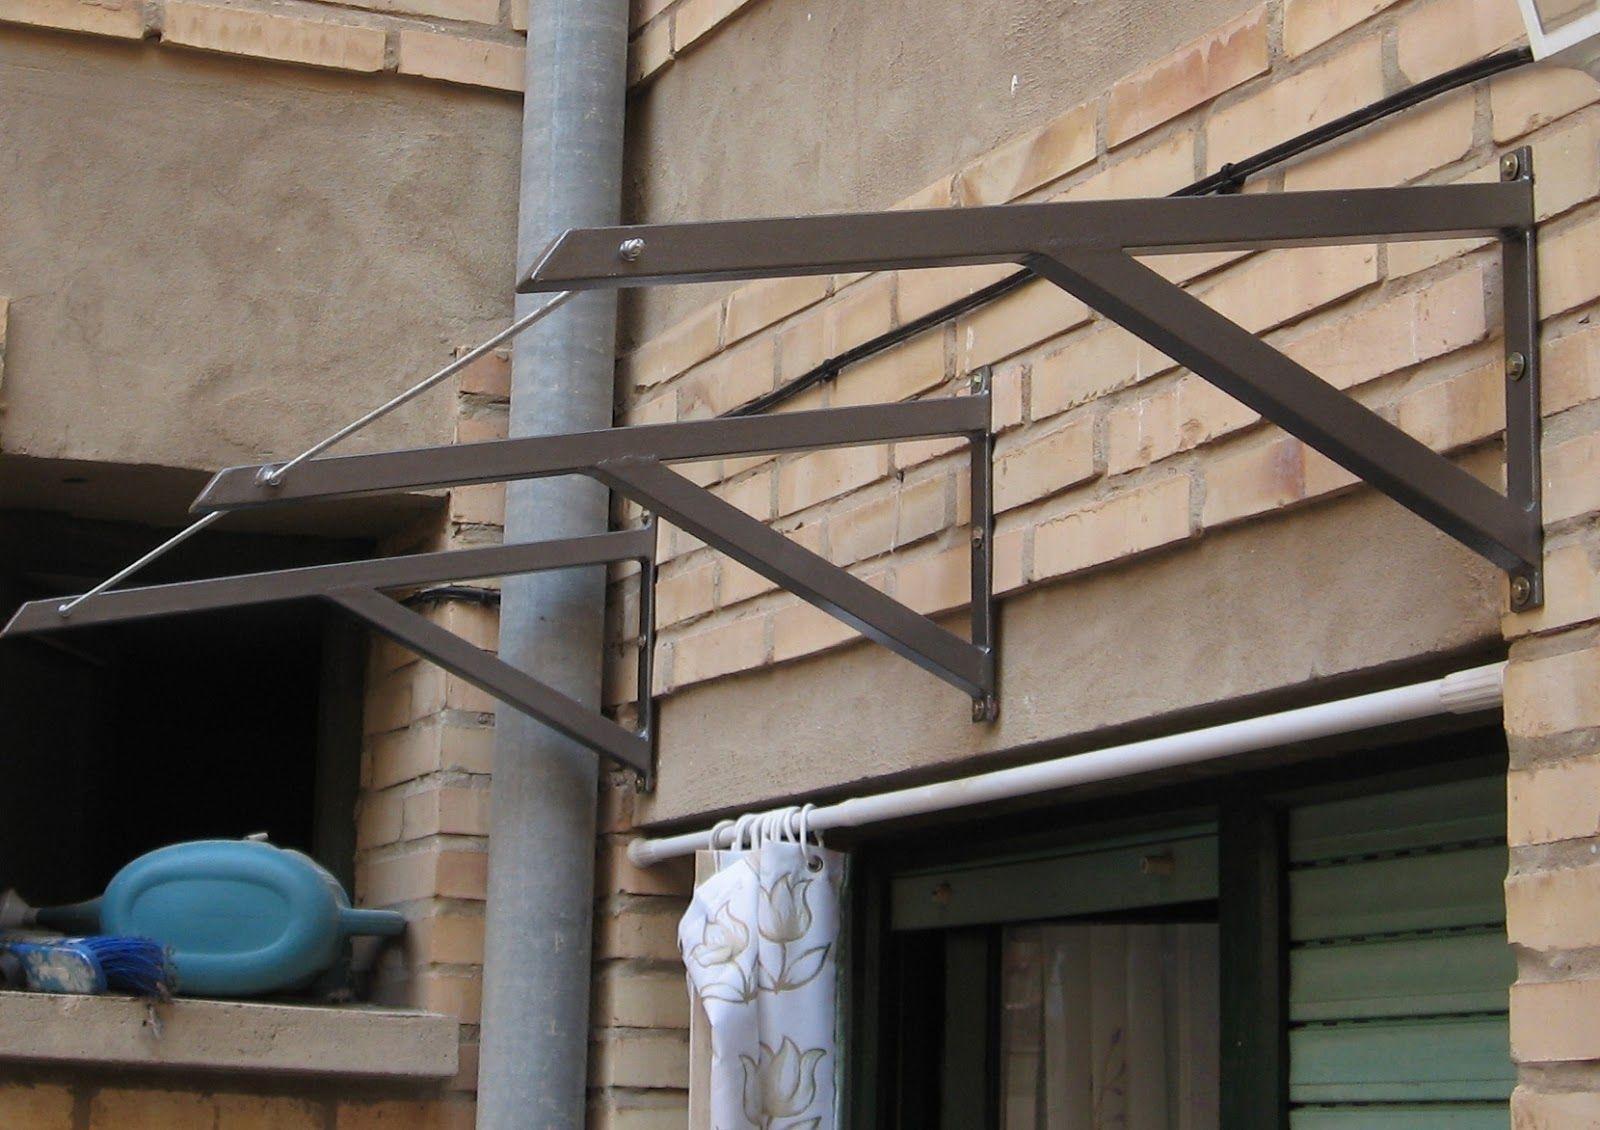 Img 0242 2 Jpg 1 600 1 130 Pixeles Metal Awning Glass Roof Pergola